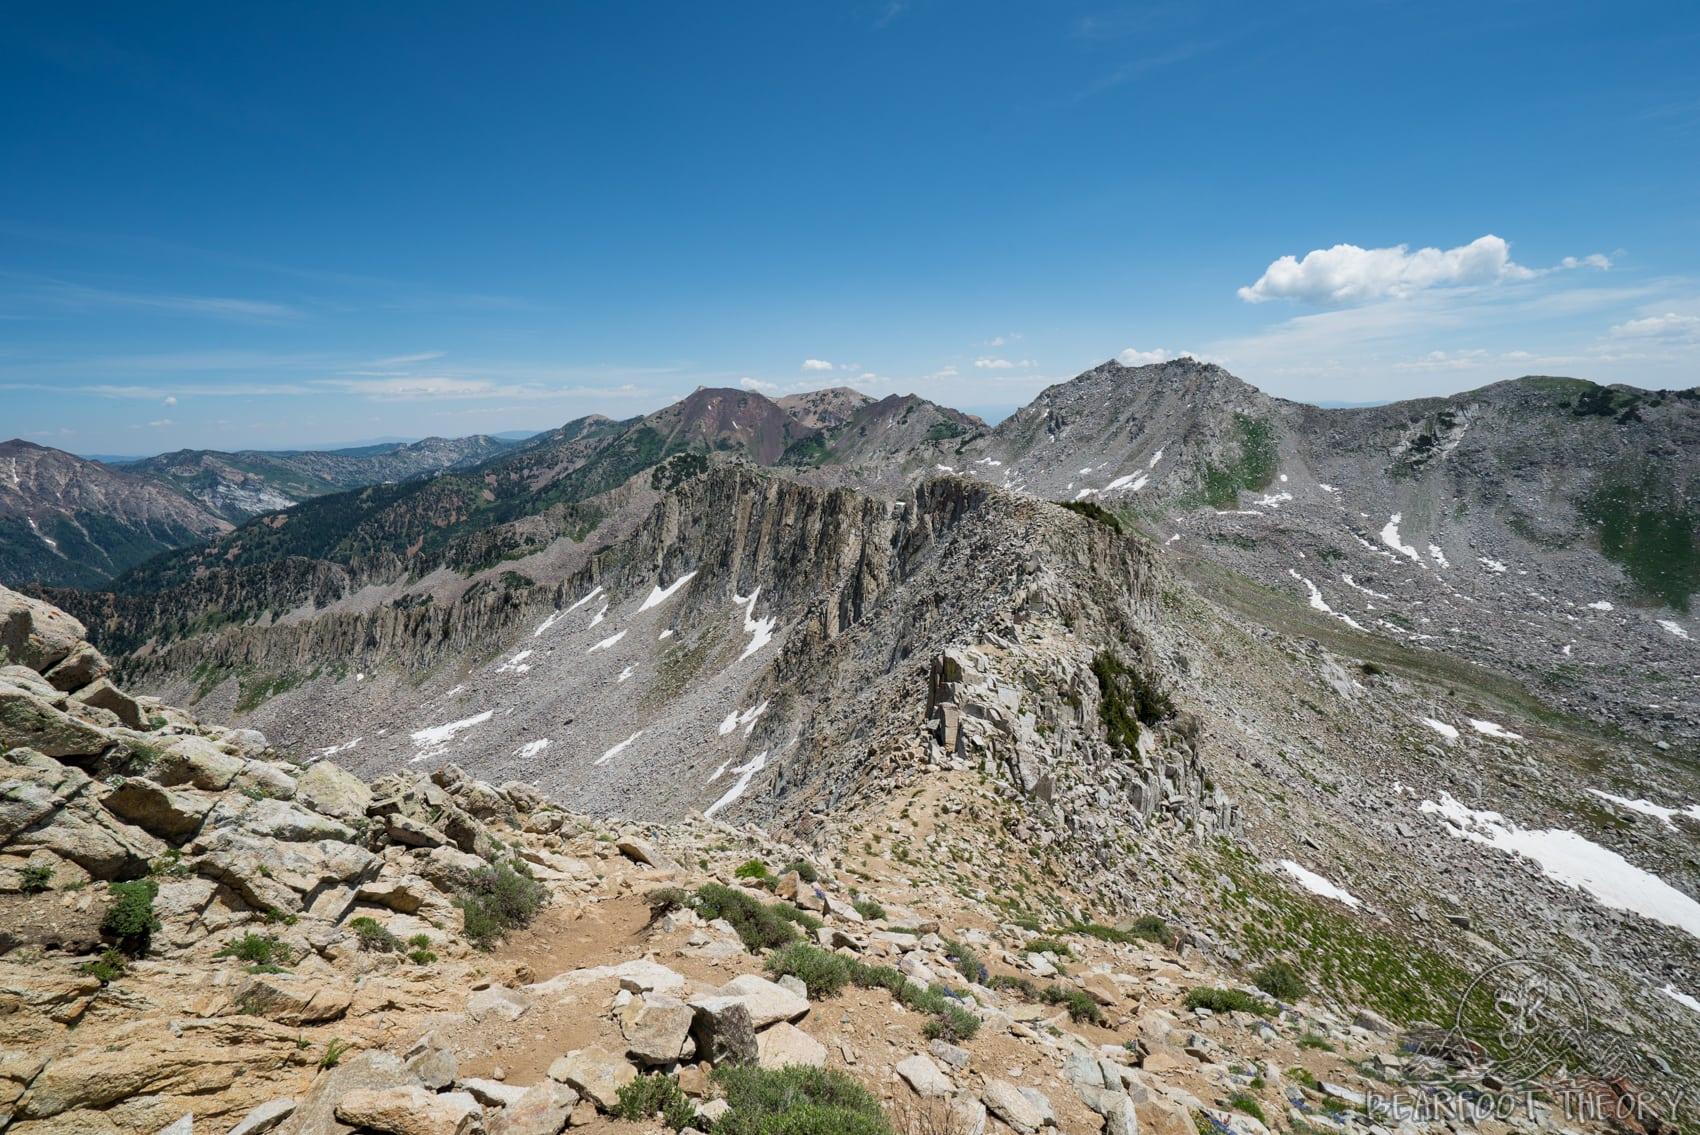 Looking down the ridgeline below the Pfeifferhorn, the third tallest peak near Salt Lake City